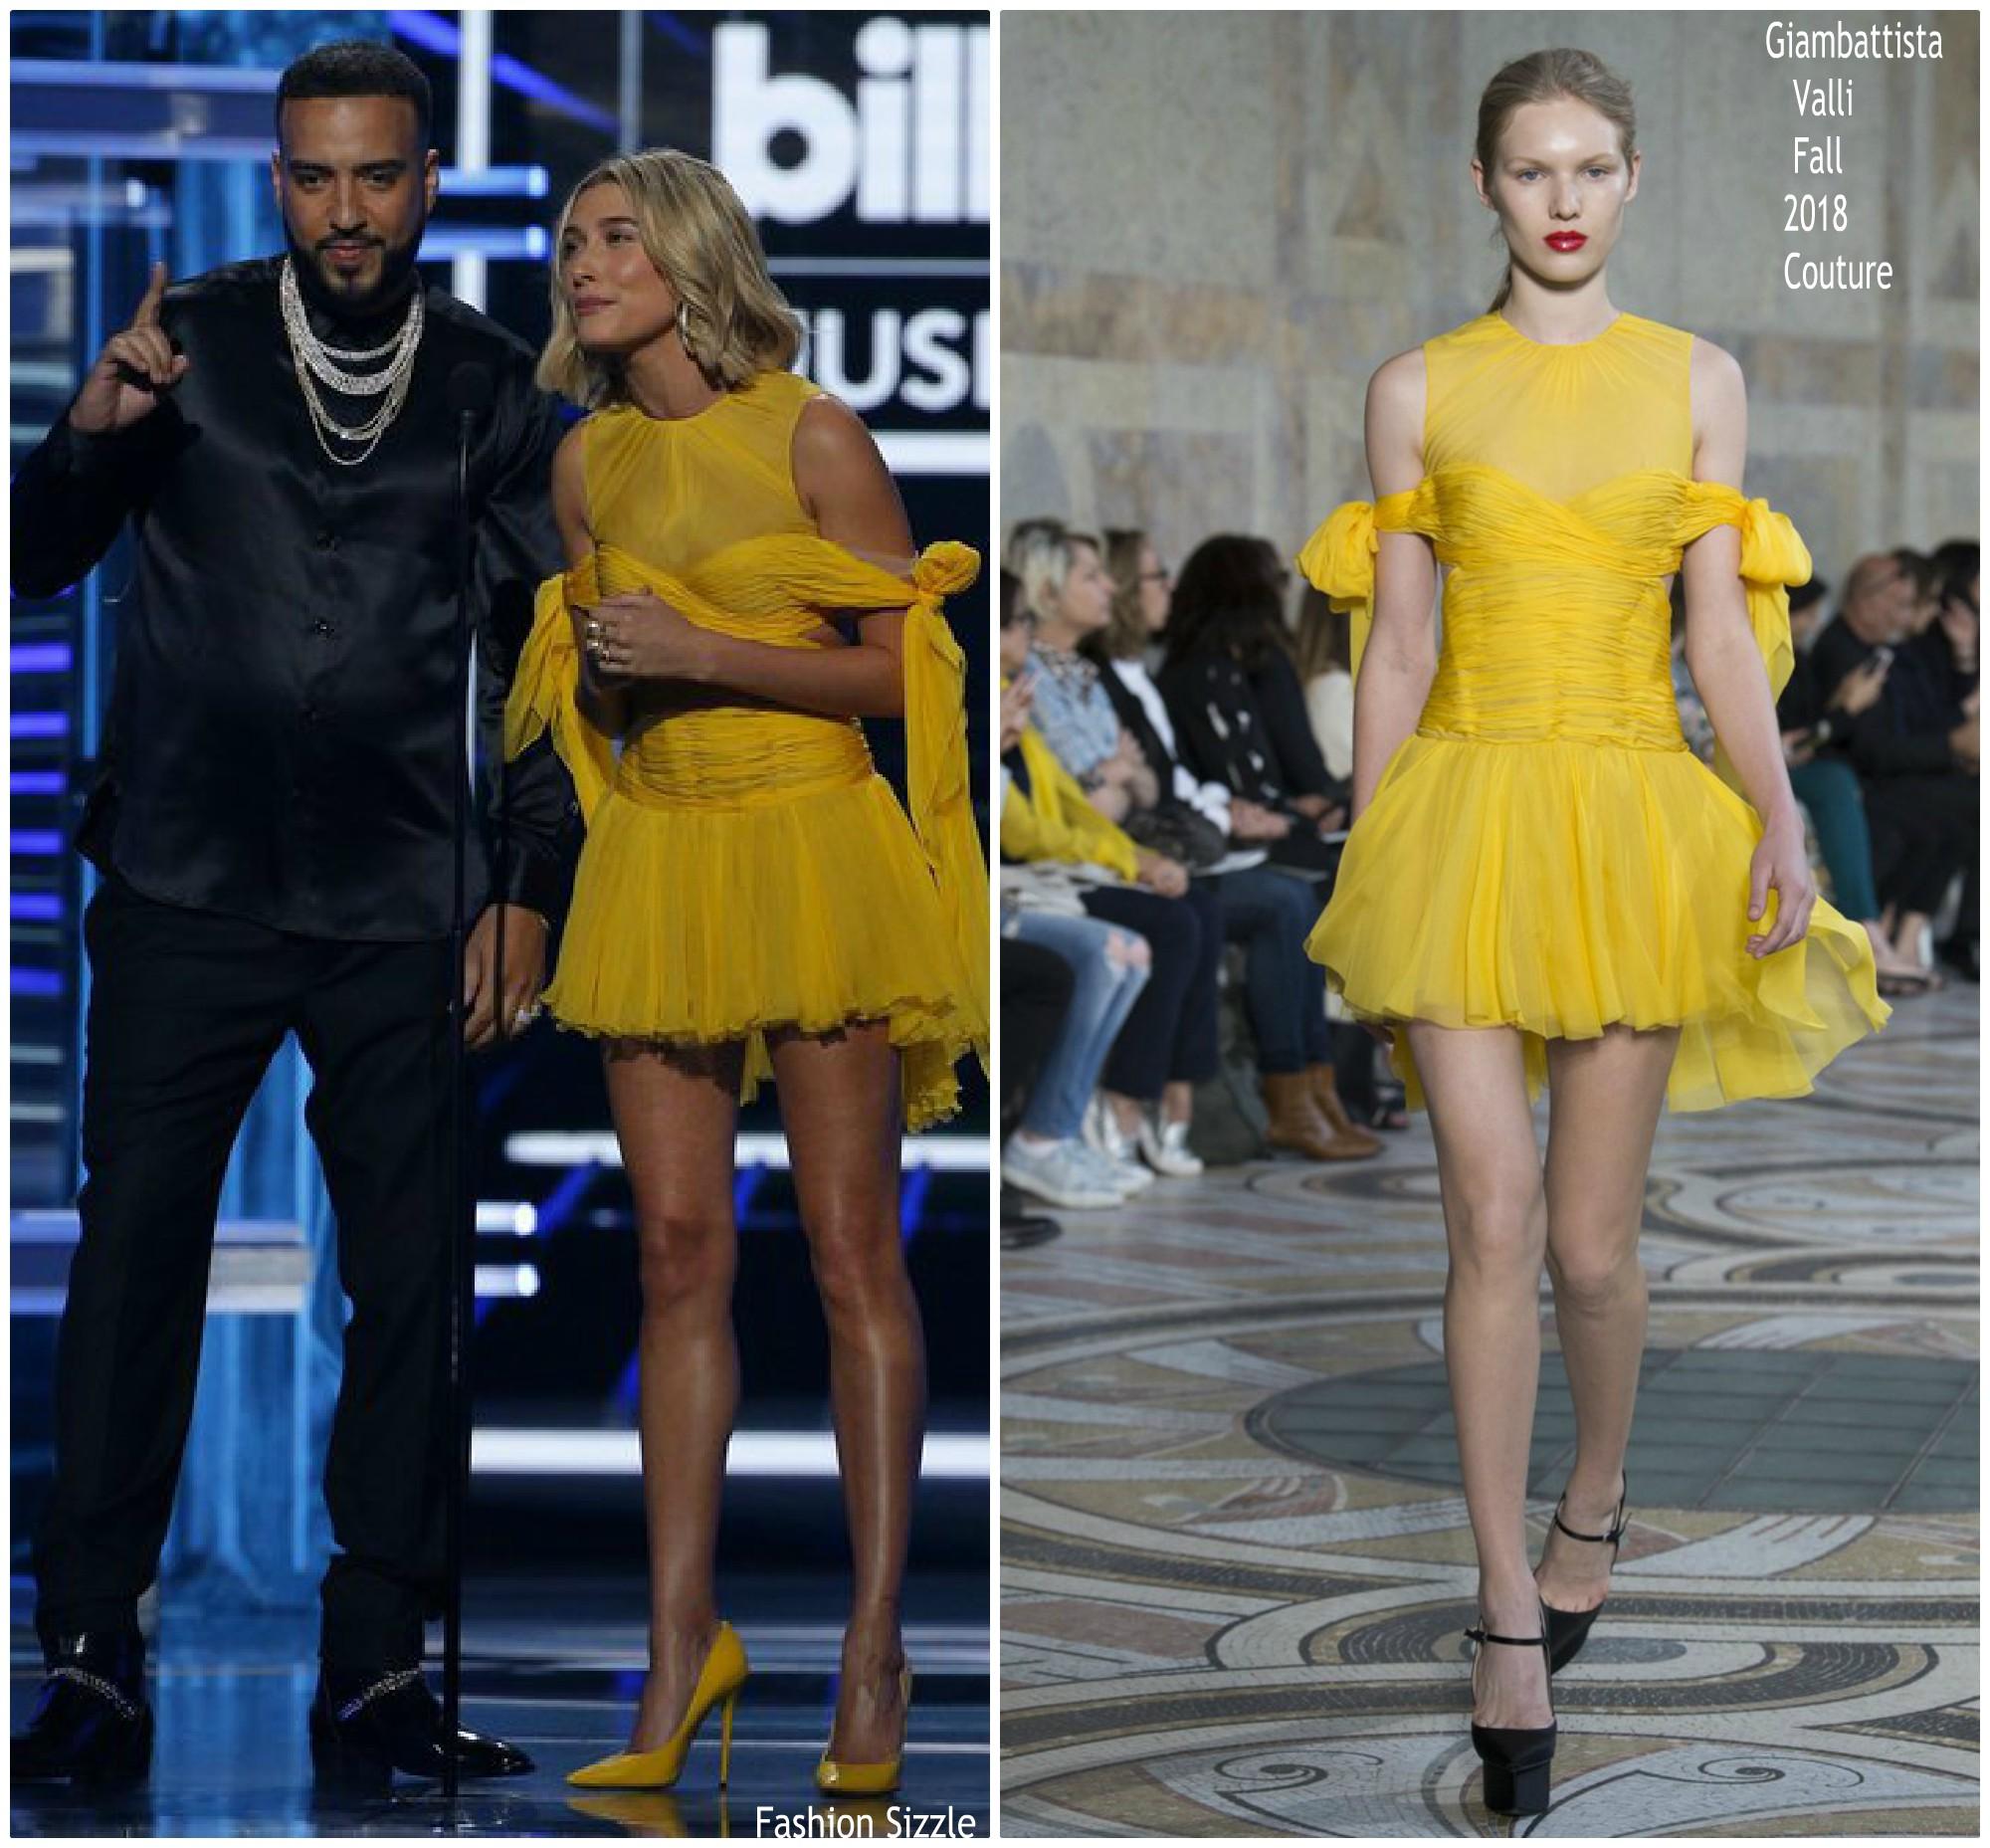 hailey-baldwin-in-giambattista-valli-couture-2018-billboard-music-awards